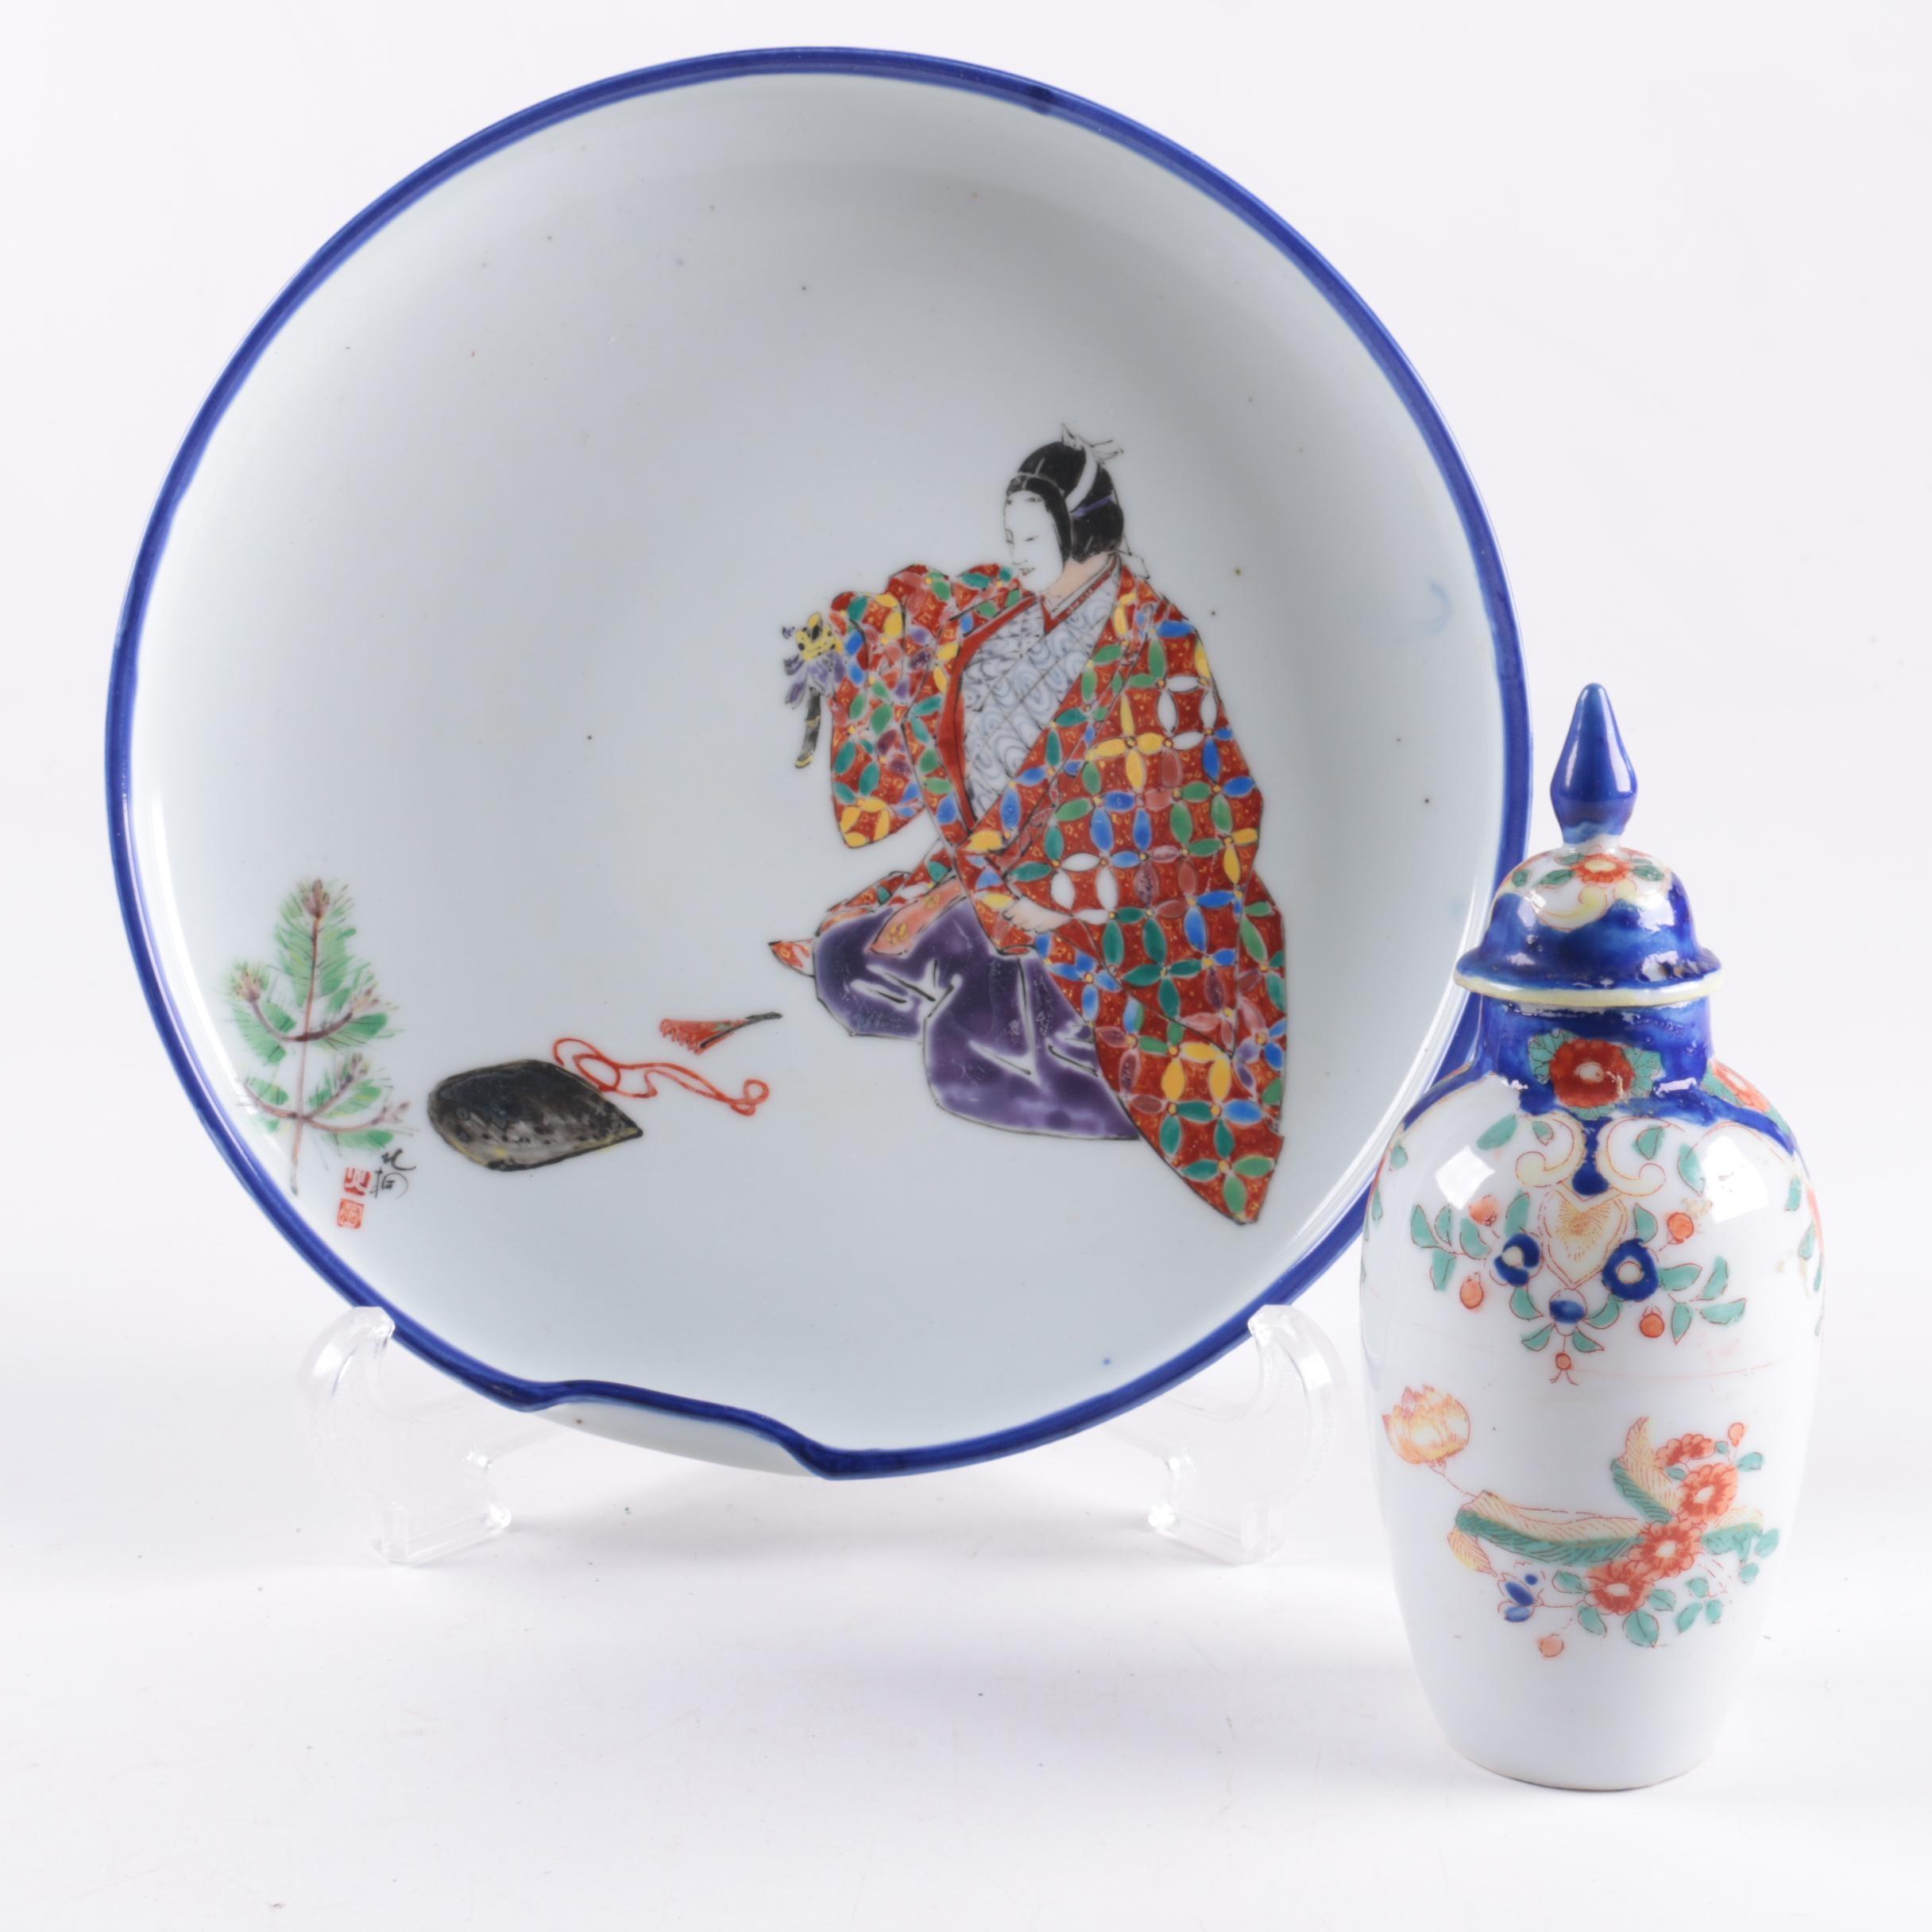 Japanese Porcelain Plate and Jar